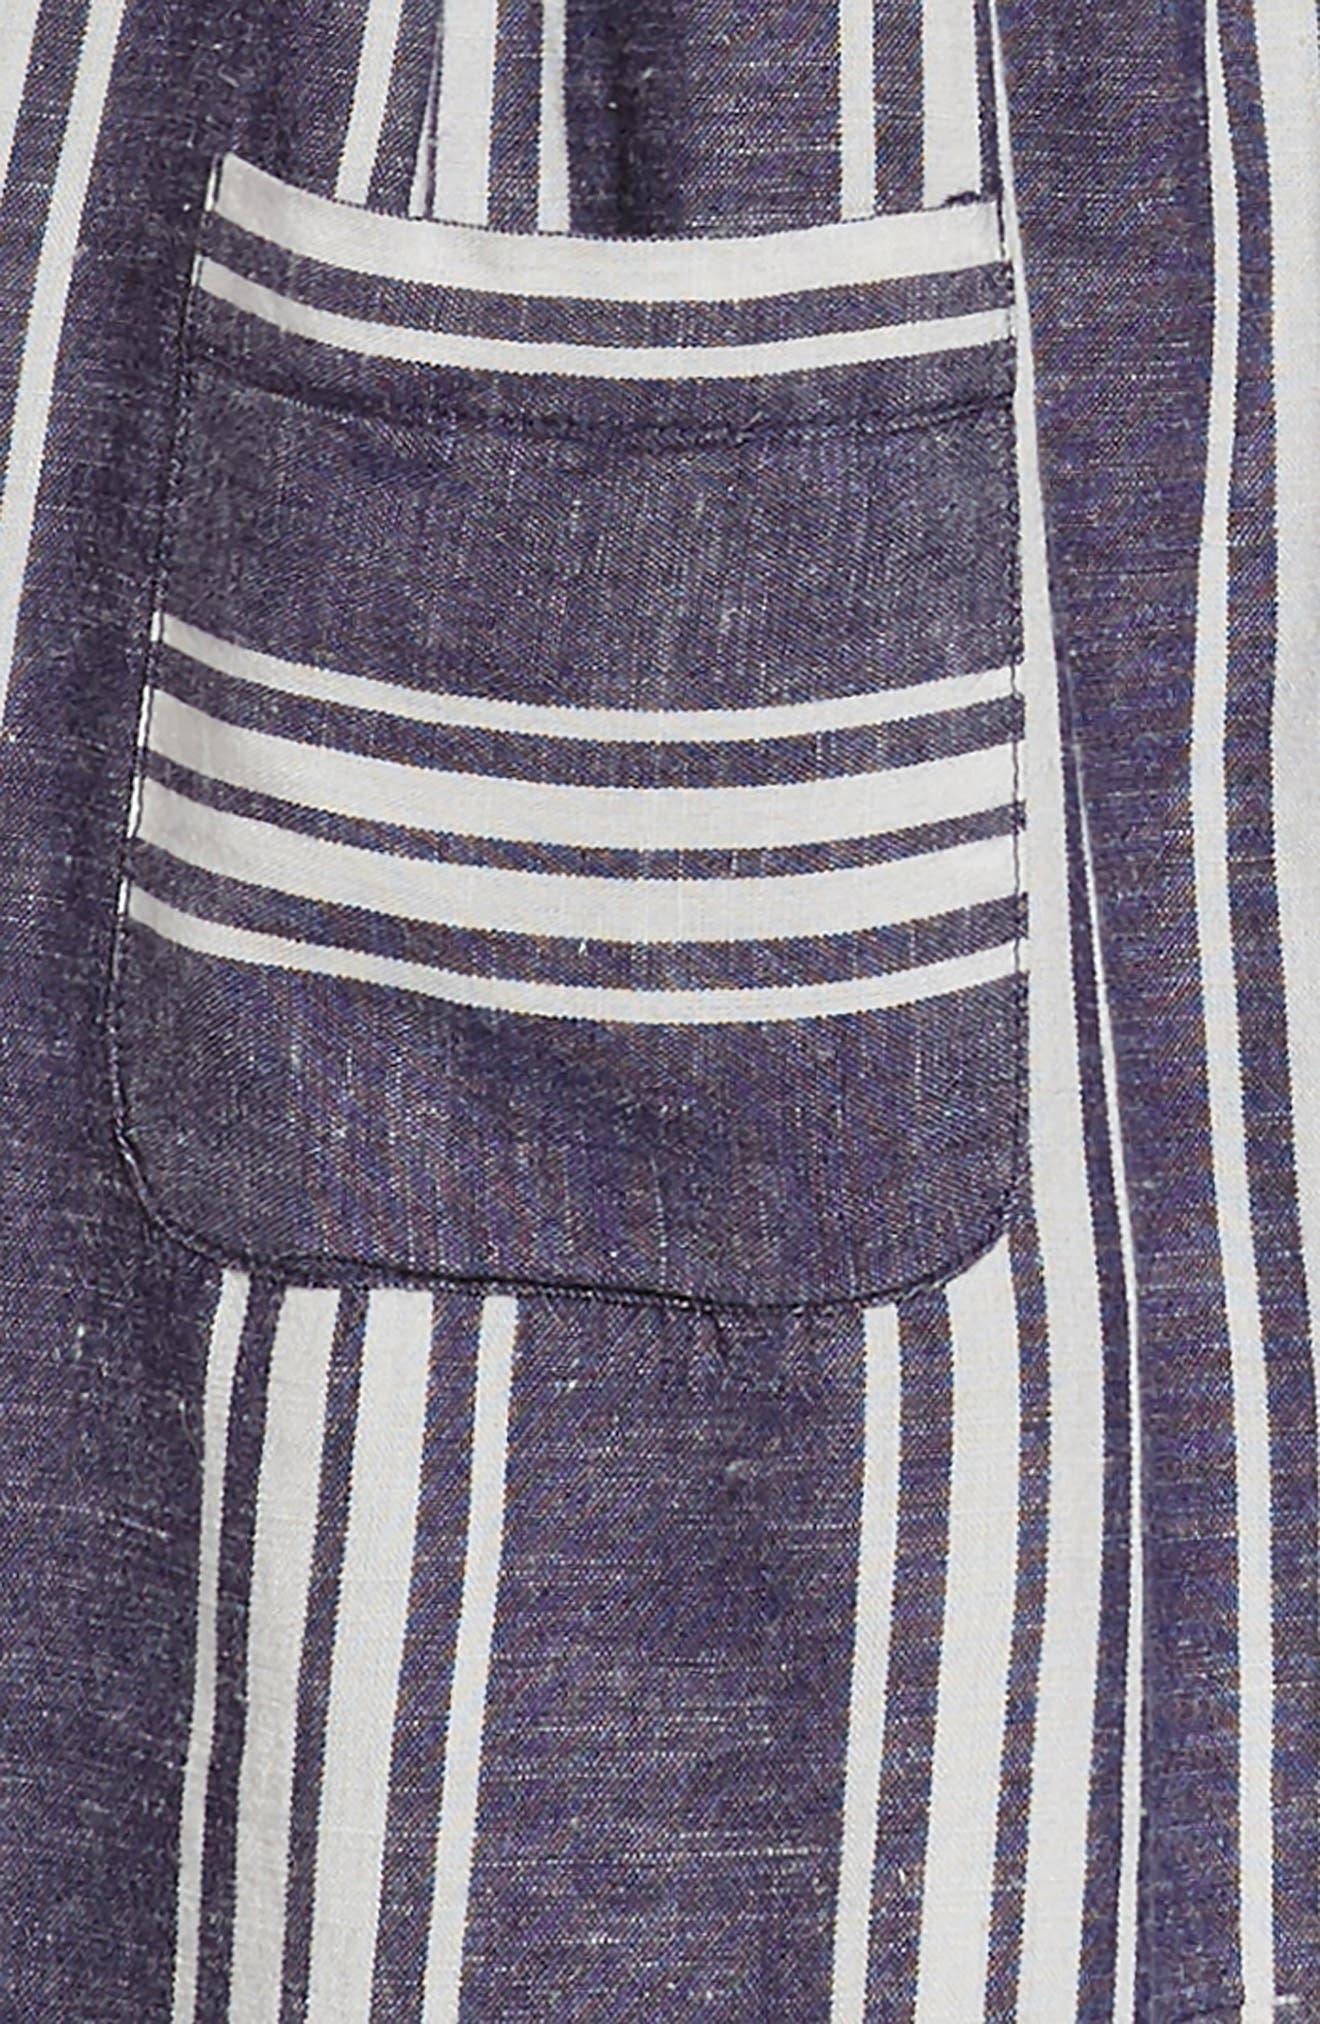 Stripe Fit & Flare Dress,                             Alternate thumbnail 3, color,